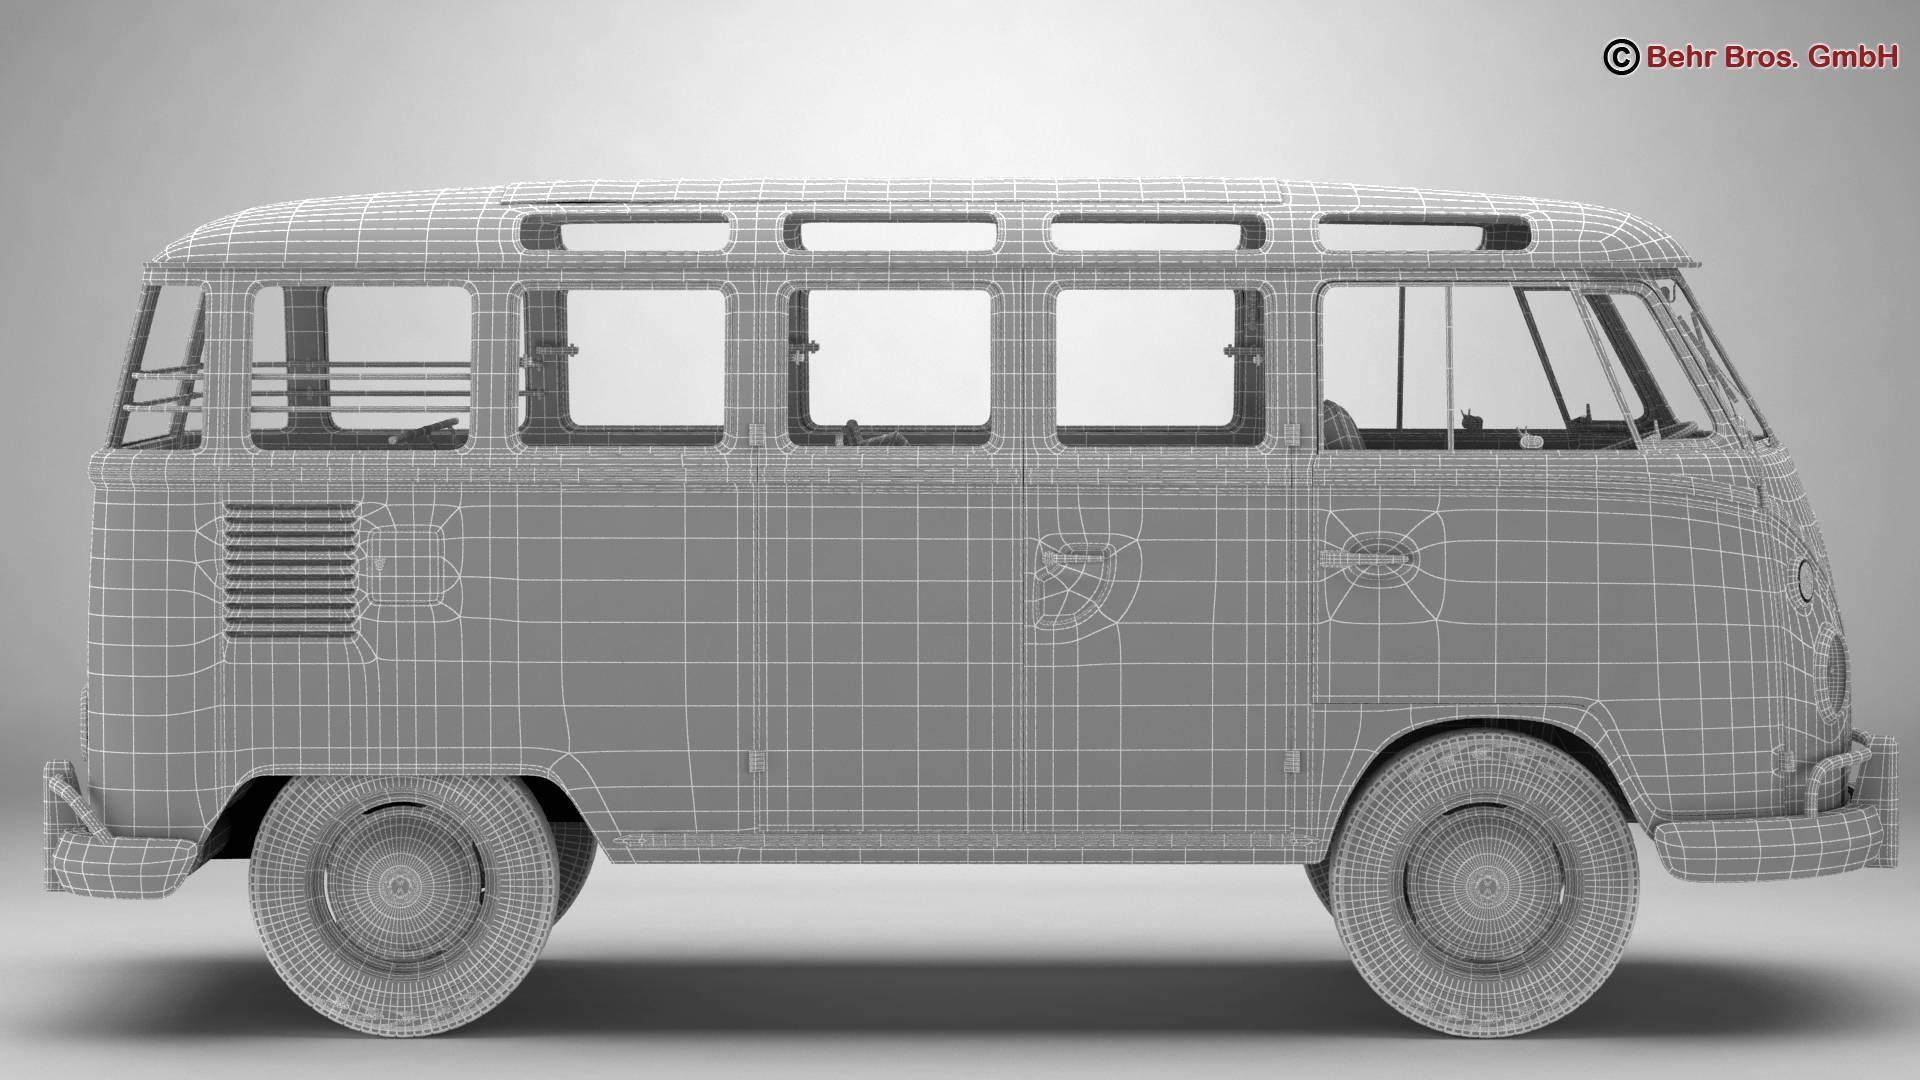 volkswagen type 2 samba 1963 hippie 3d model 3ds max fbx c4d lwo ma mb obj 217262